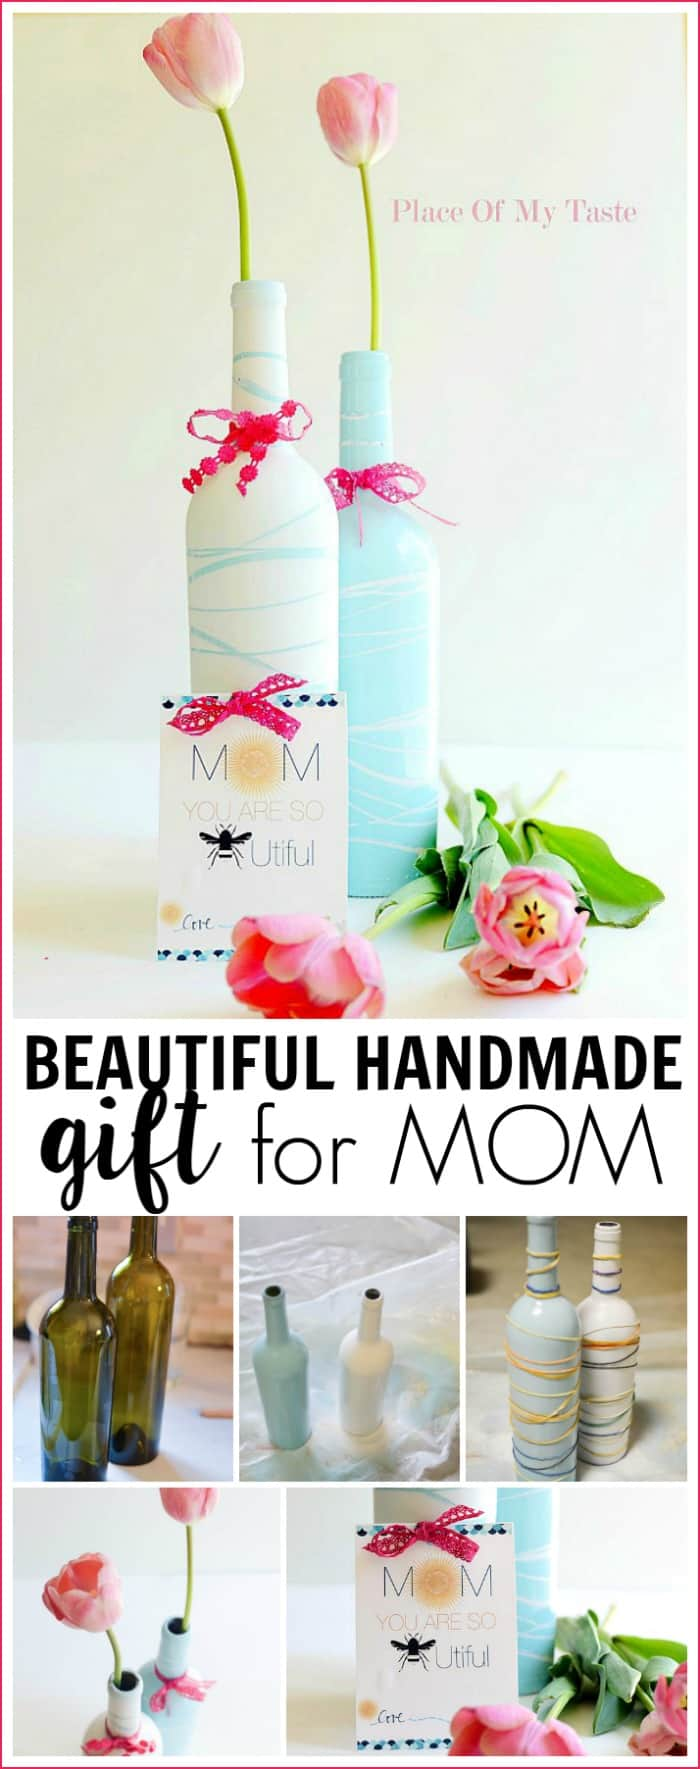 BEAUTIFUL HANDMADE GIFT FOR MOM